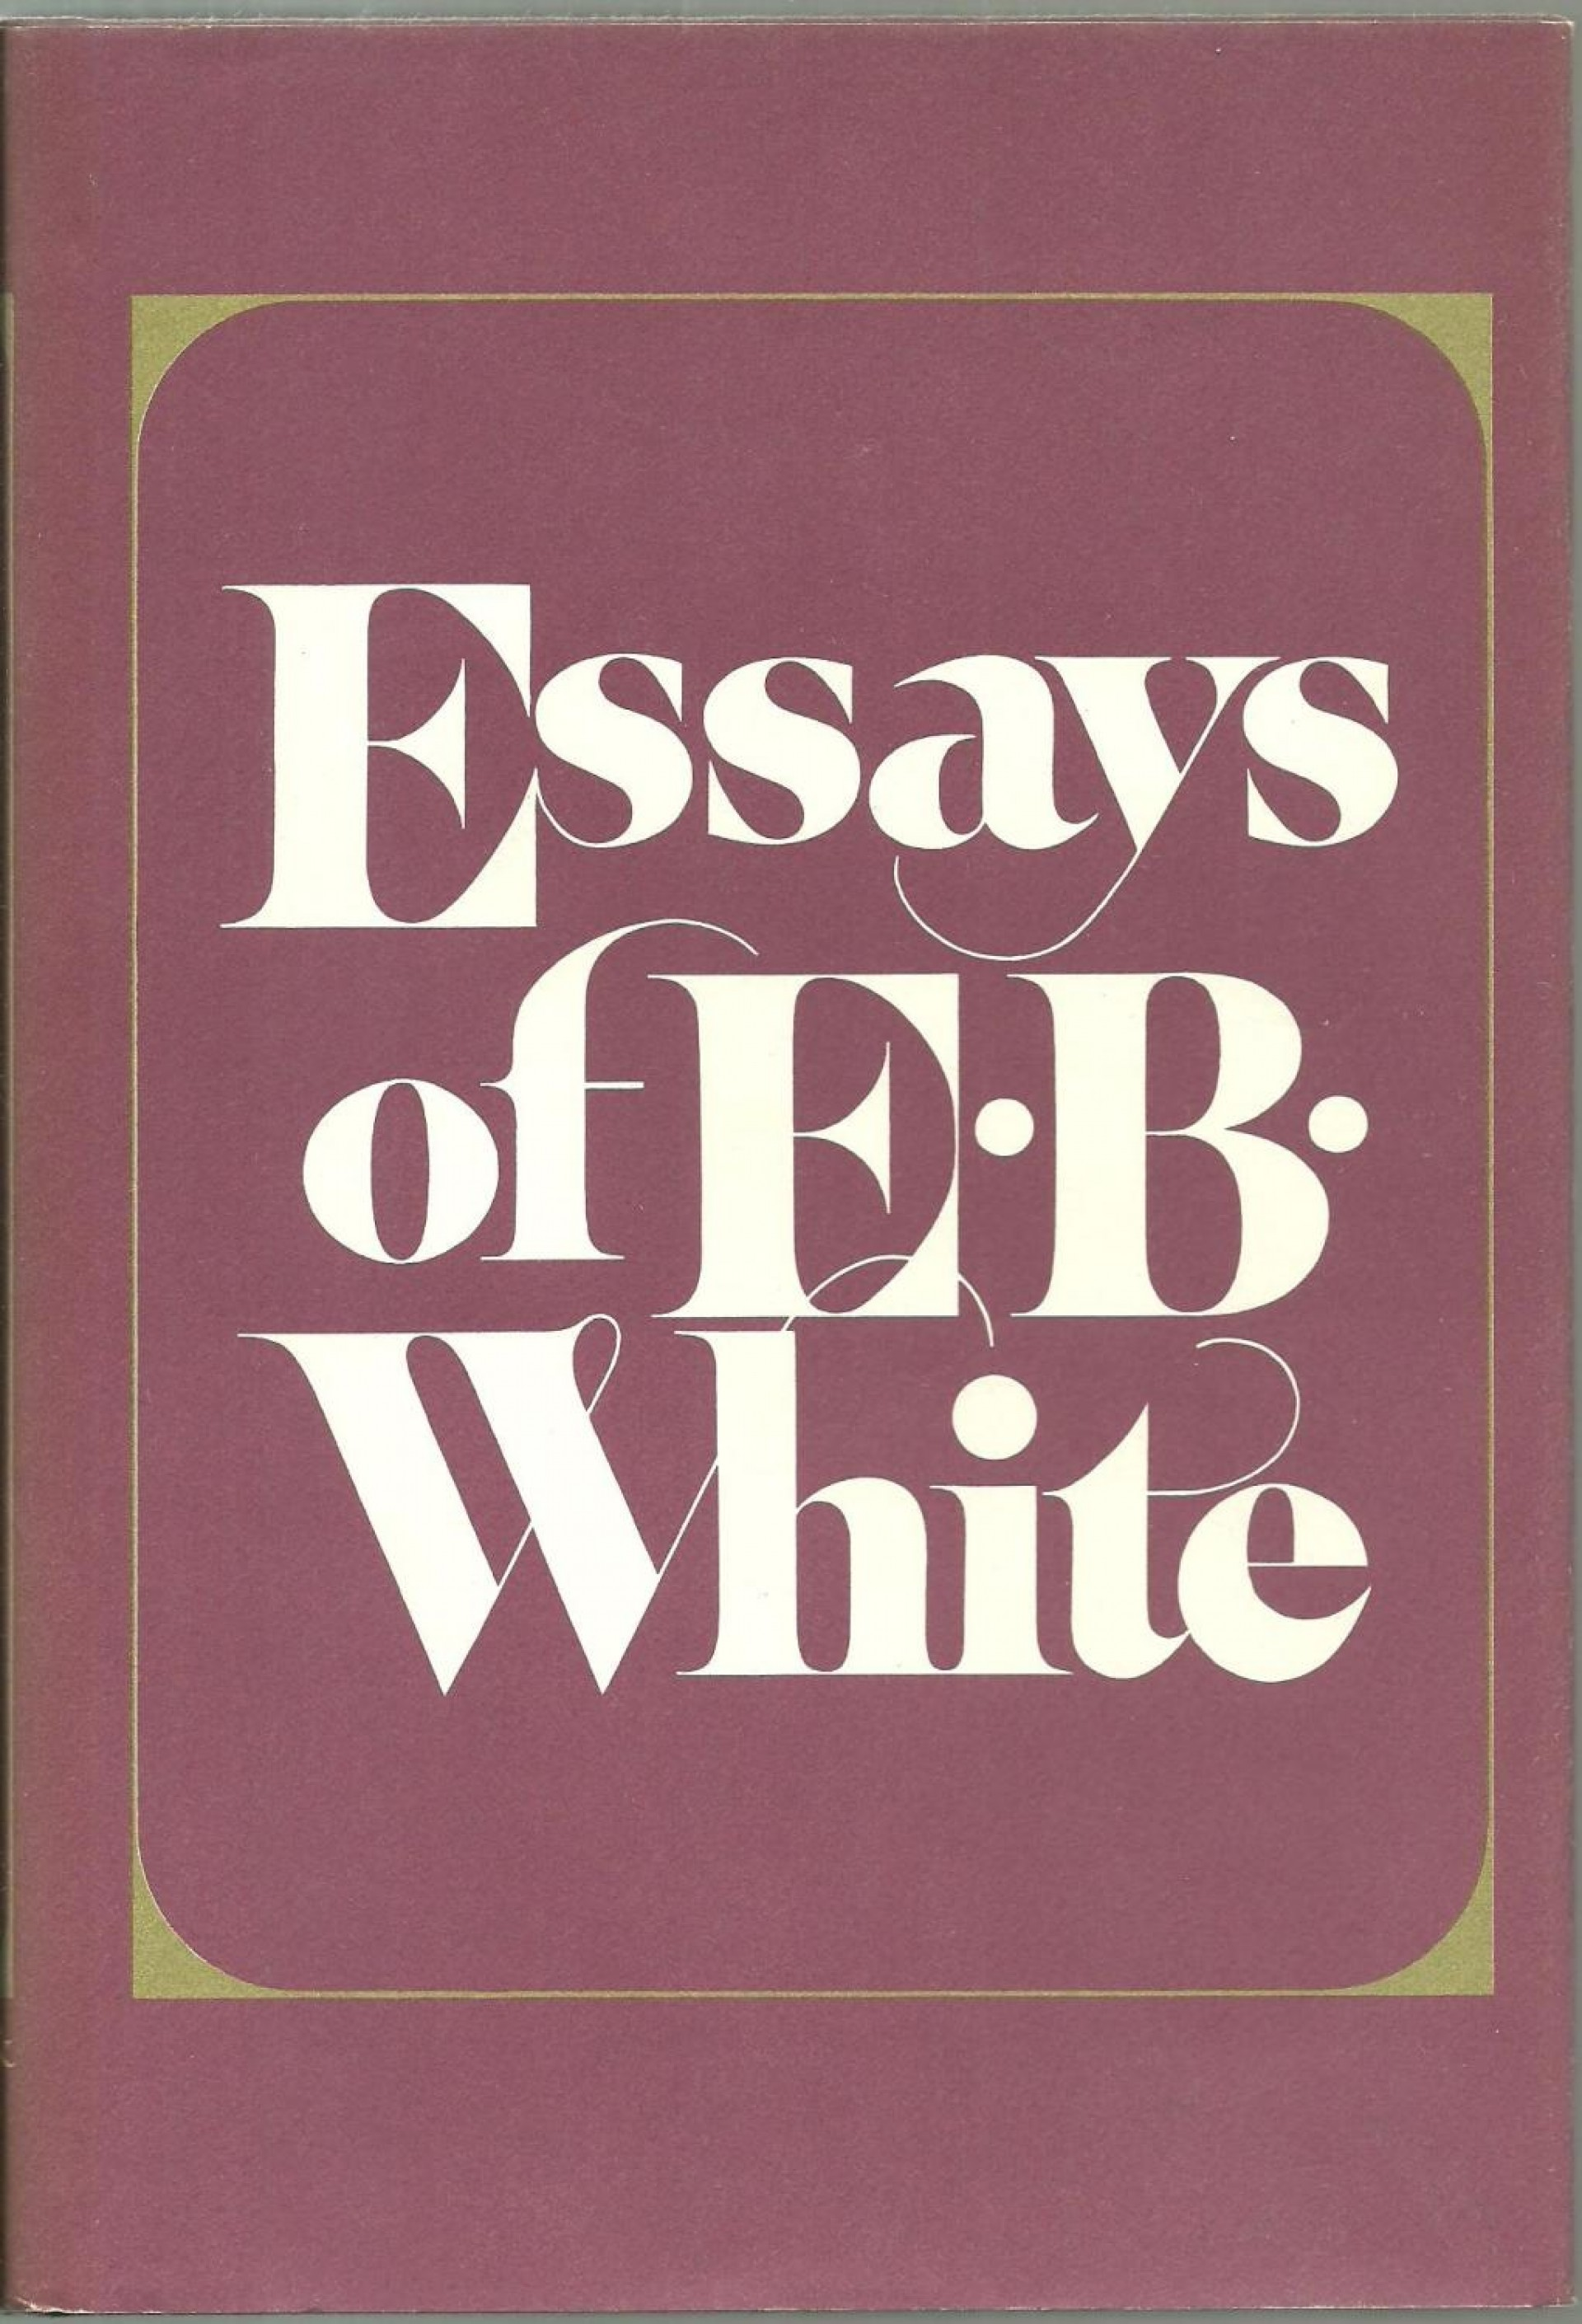 007 Essays Of White Essay Impressive Eb Analysis Audiobook 1920